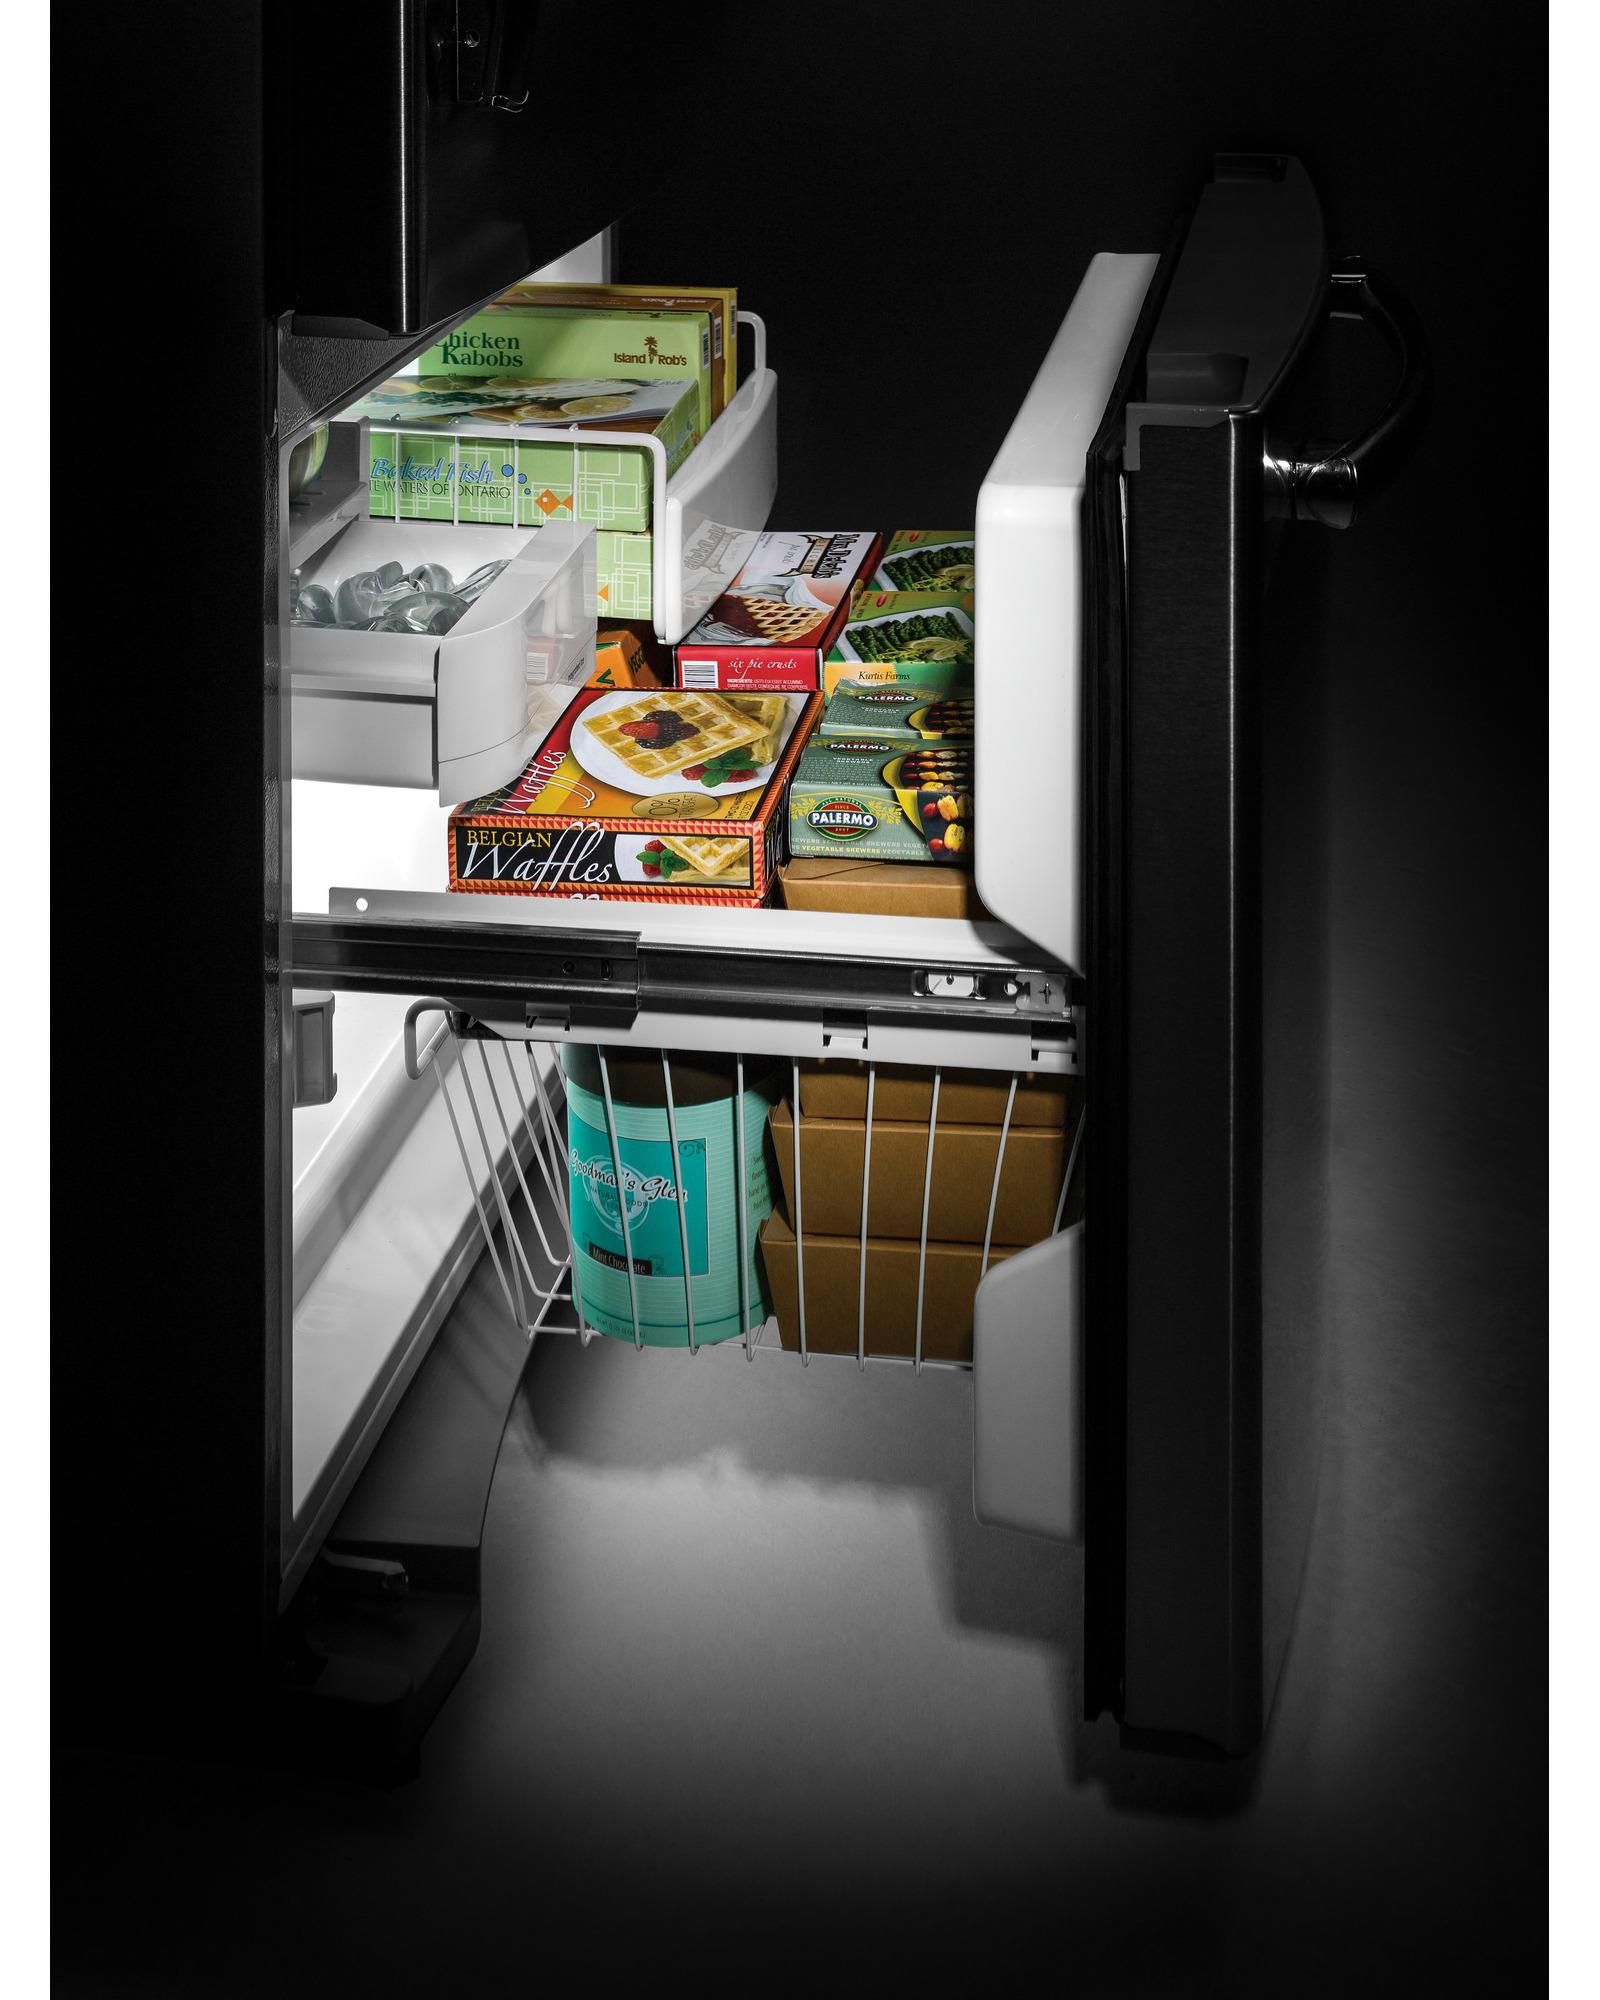 GE Appliances 23.2 cu. ft. Bottom-Freezer Drawer Refrigerator - Black